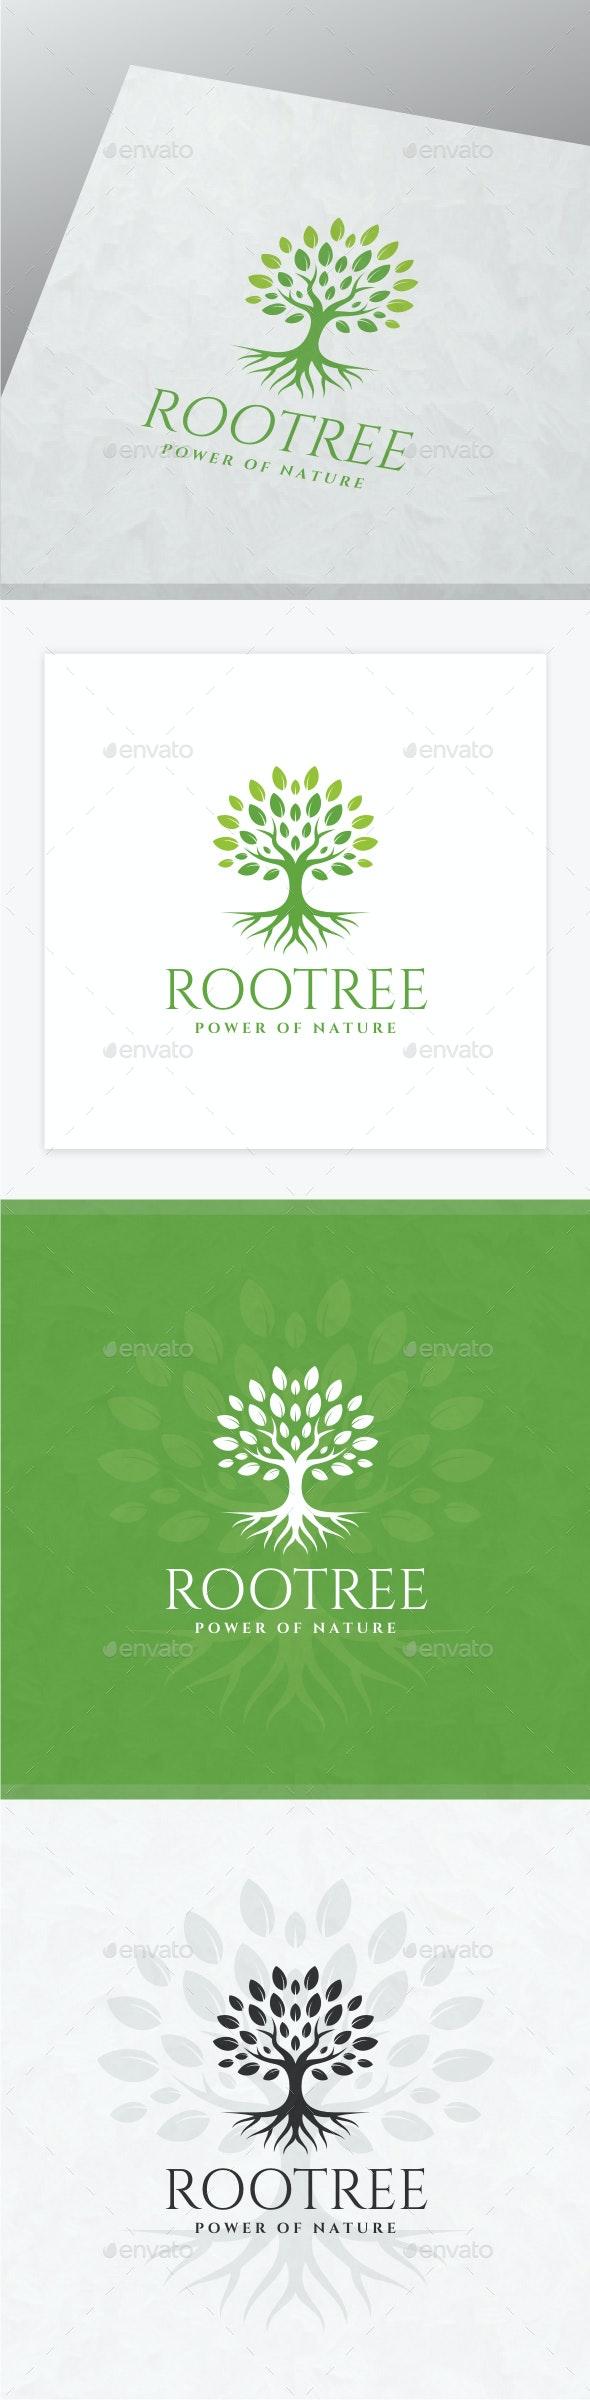 Root Tree Logo - Nature Logo Templates